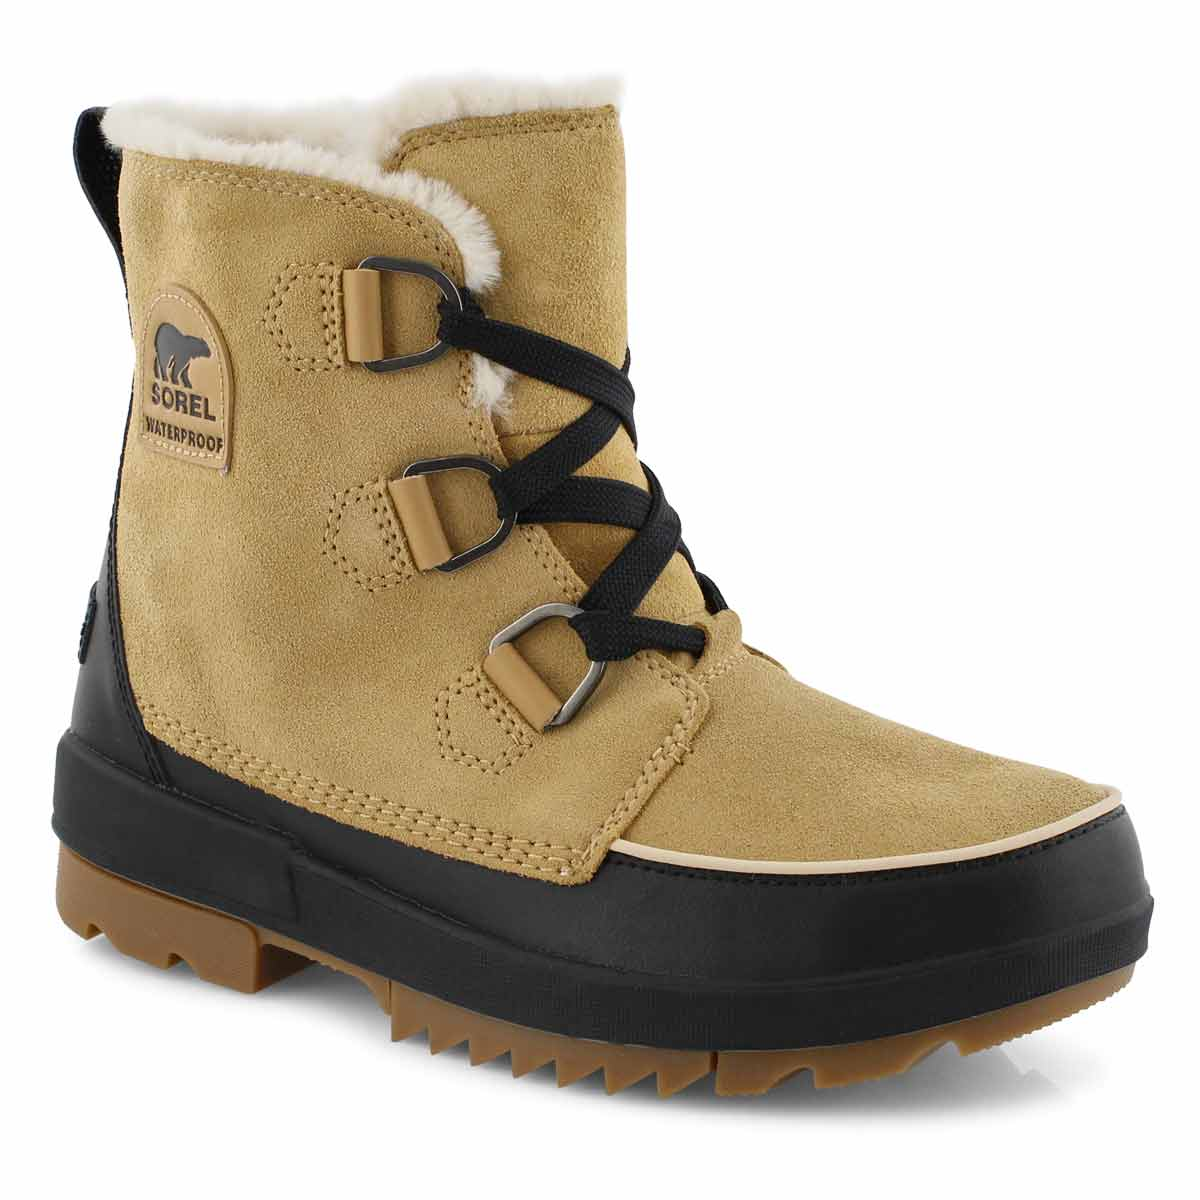 Women's TIVOLI IV curry/ black waterproof boots